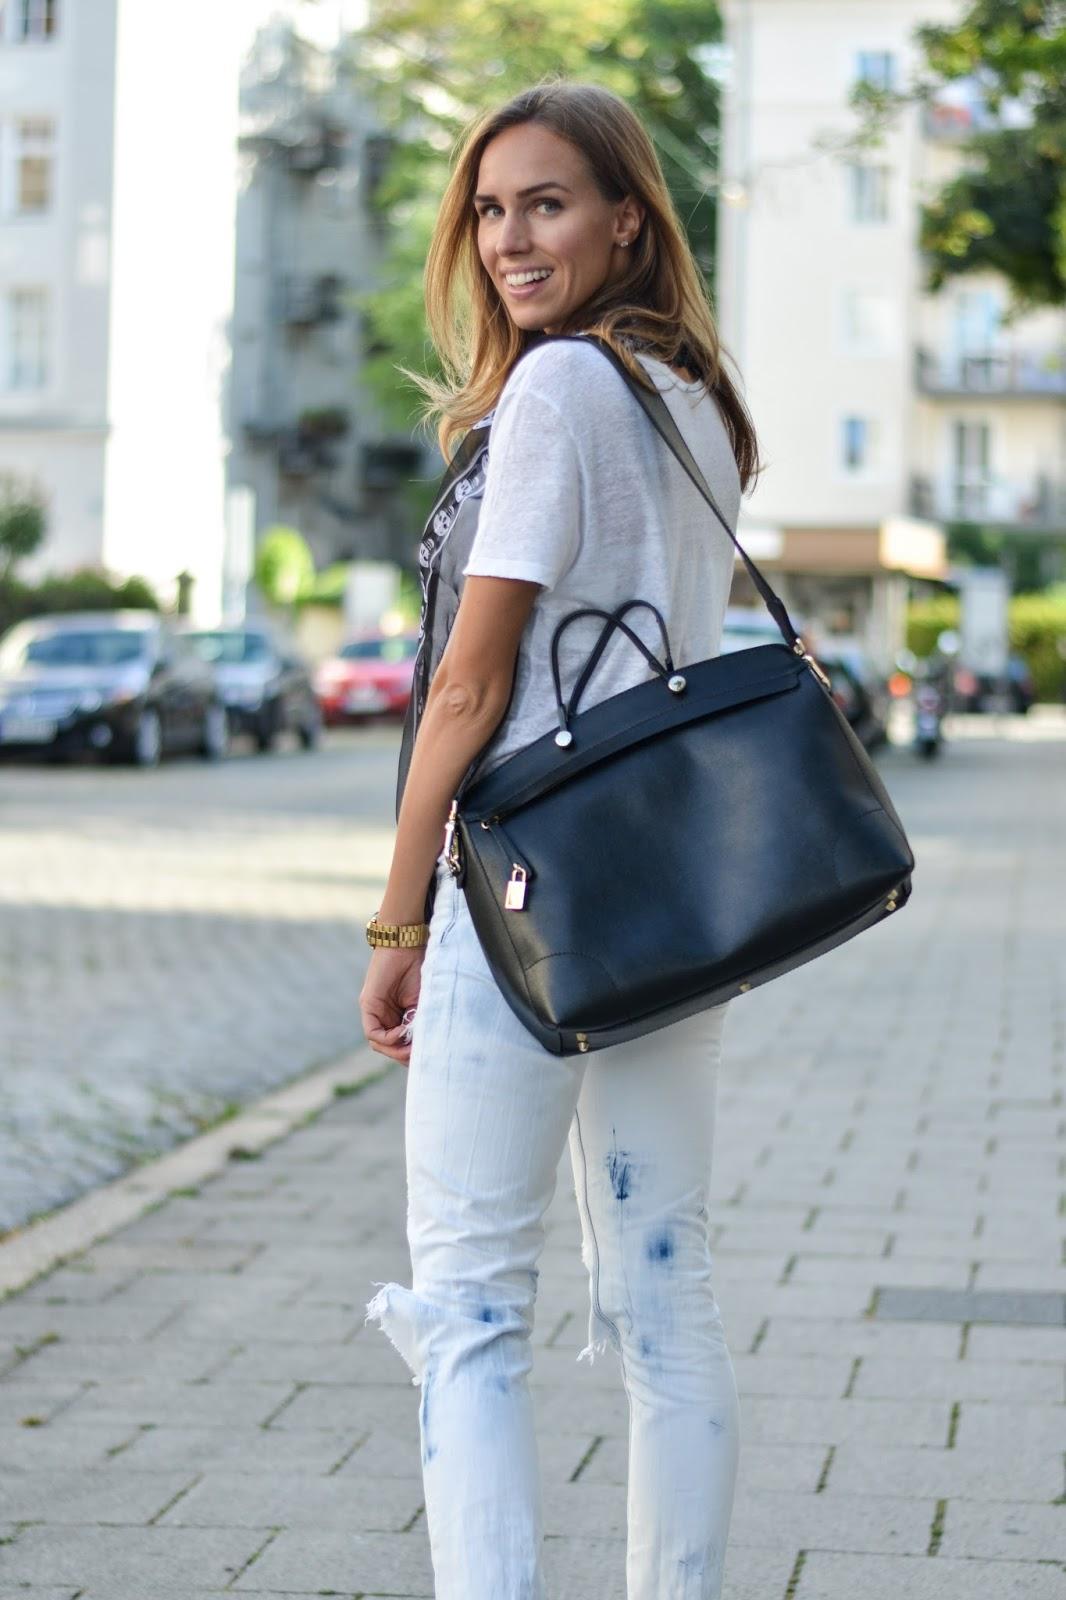 kristjaana mere black furla bag white tee white jeans outfit